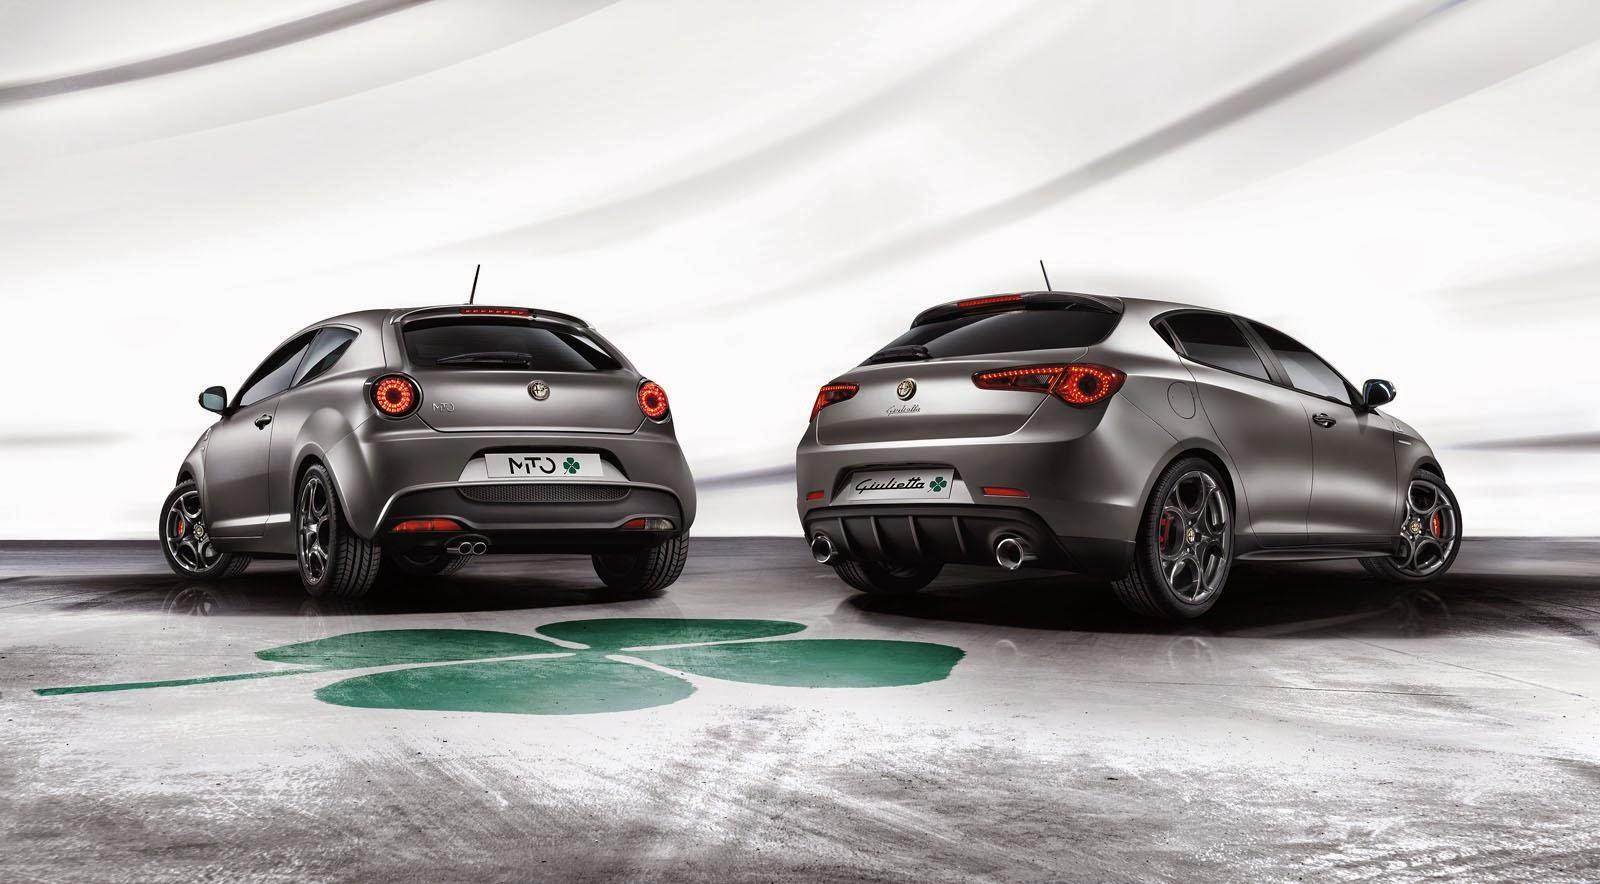 [Resim: Alfa+Romeo+MiTo+ve+Giulietta+Quadrifoglio+Verde+2.jpg]